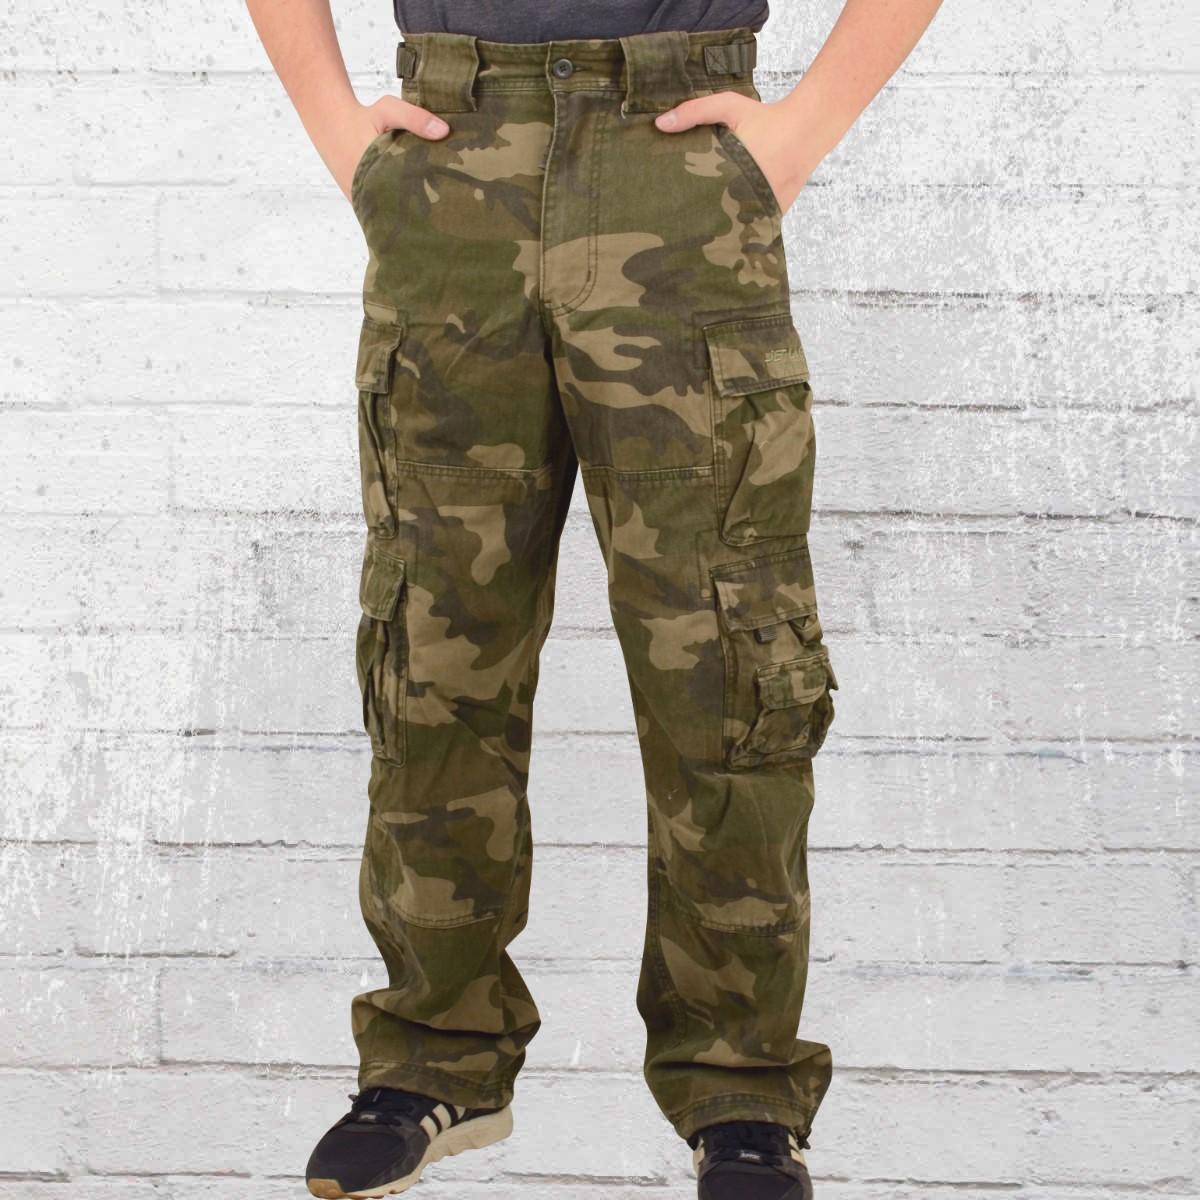 3c3df6125e Order now | Jet Lag Mens Cargo Pocket Pants 007 camouflage